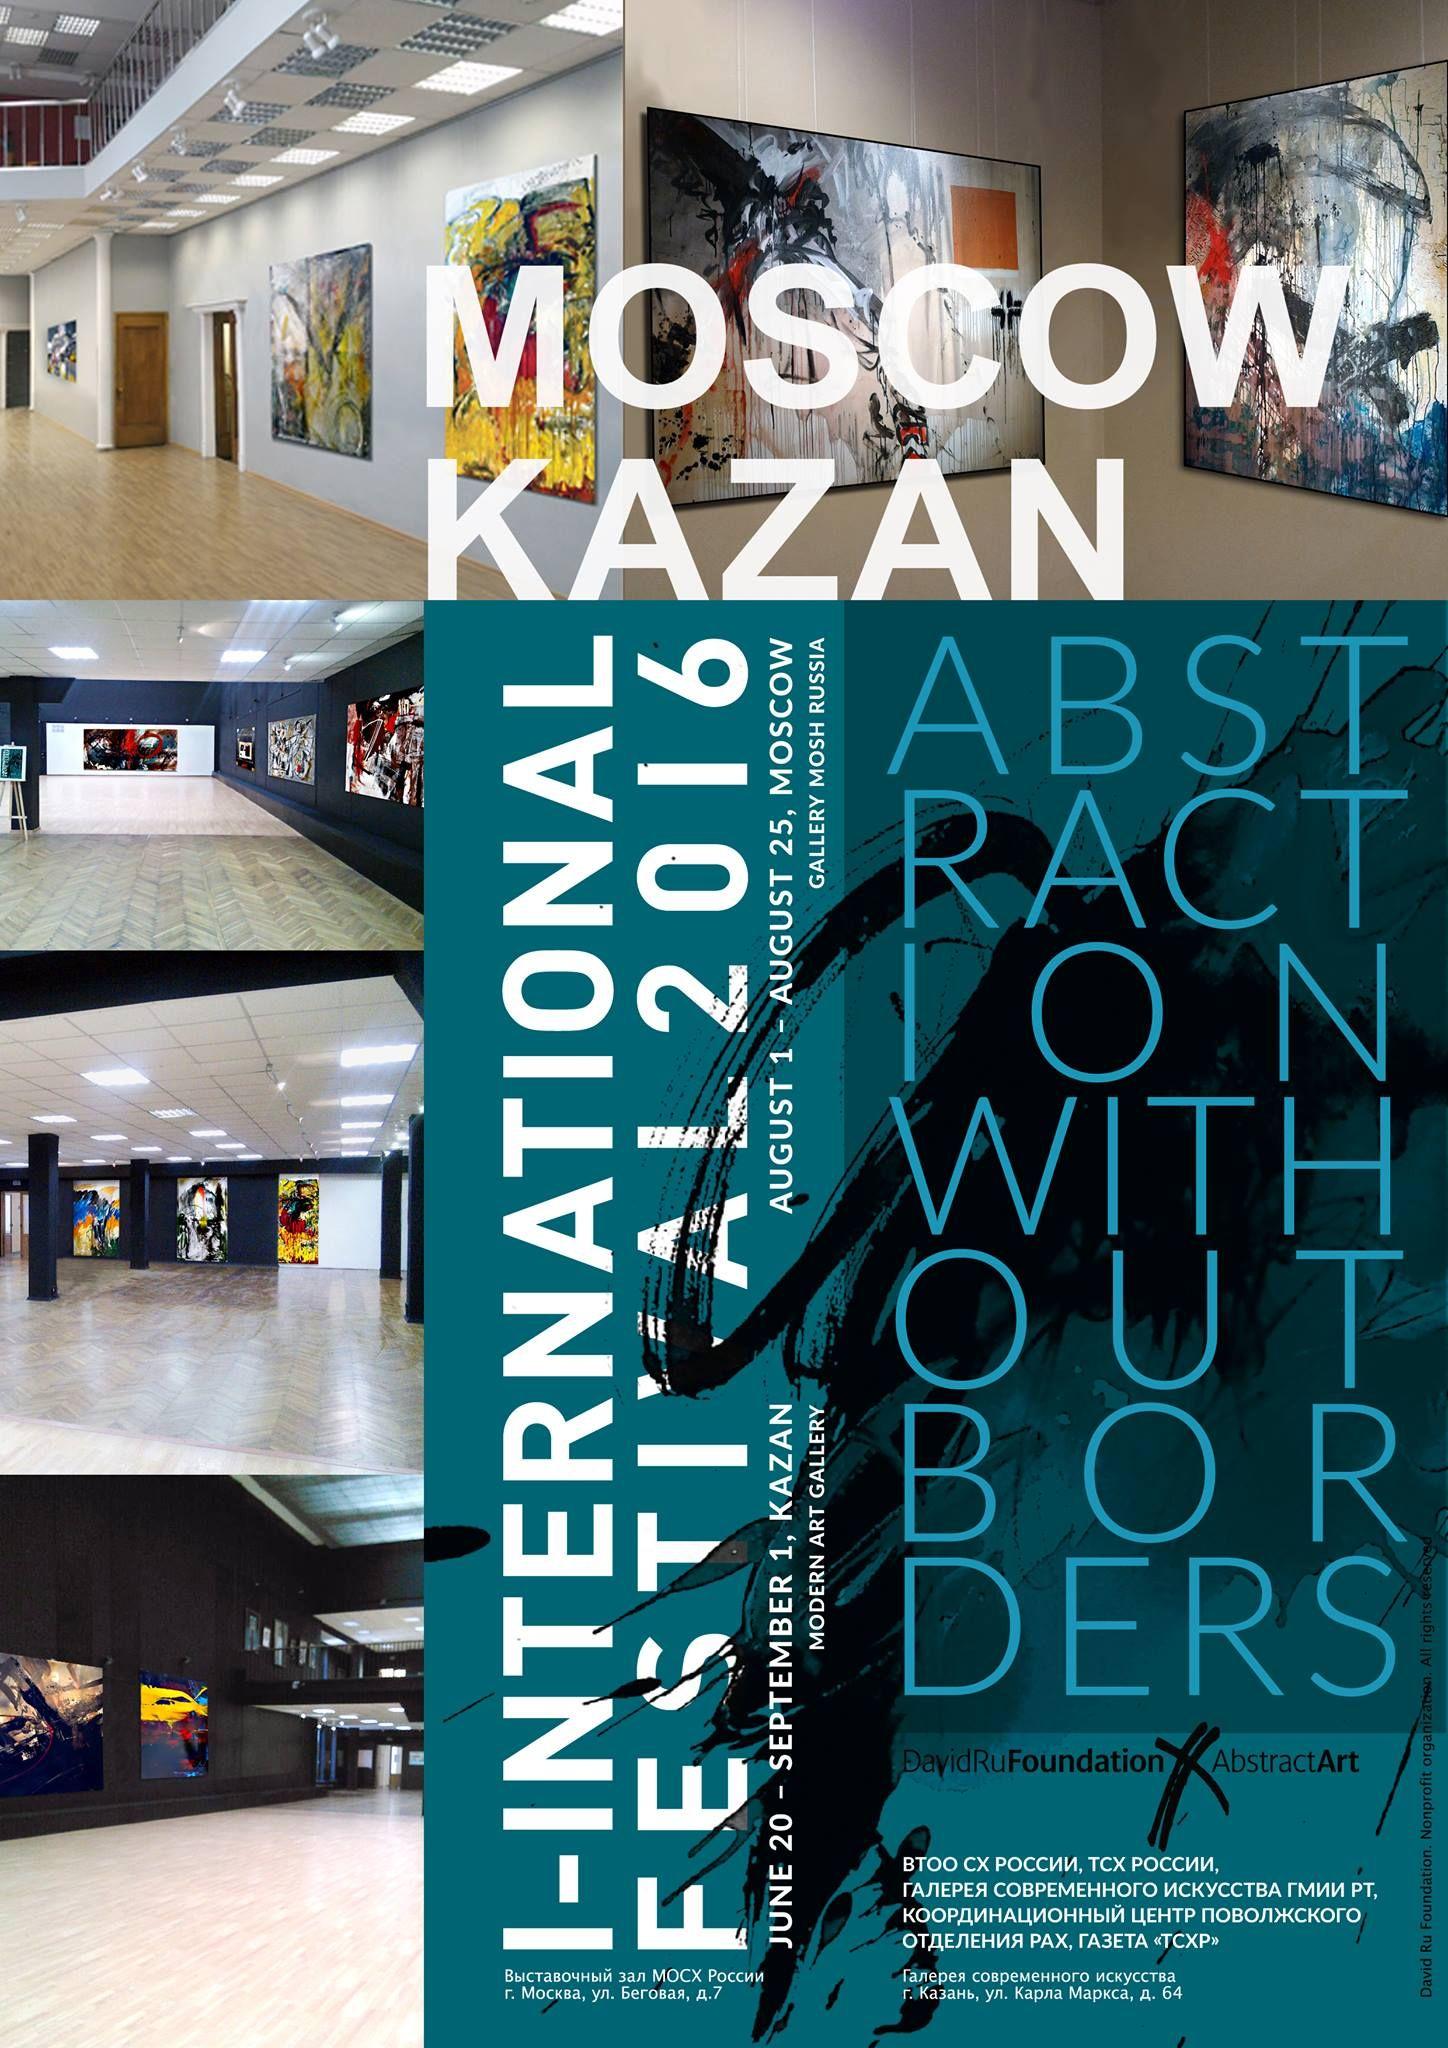 "I INTERNATIONAL FESTIVAL ""ABSTRACTION WITHOUT BORDERS"" 2016  June 20 – September 1, 2016, Modern Art Gallery, Kazan, Russia August 1 – August 25, 2016, Gallery MOSH Russia, Moscow, Russia"